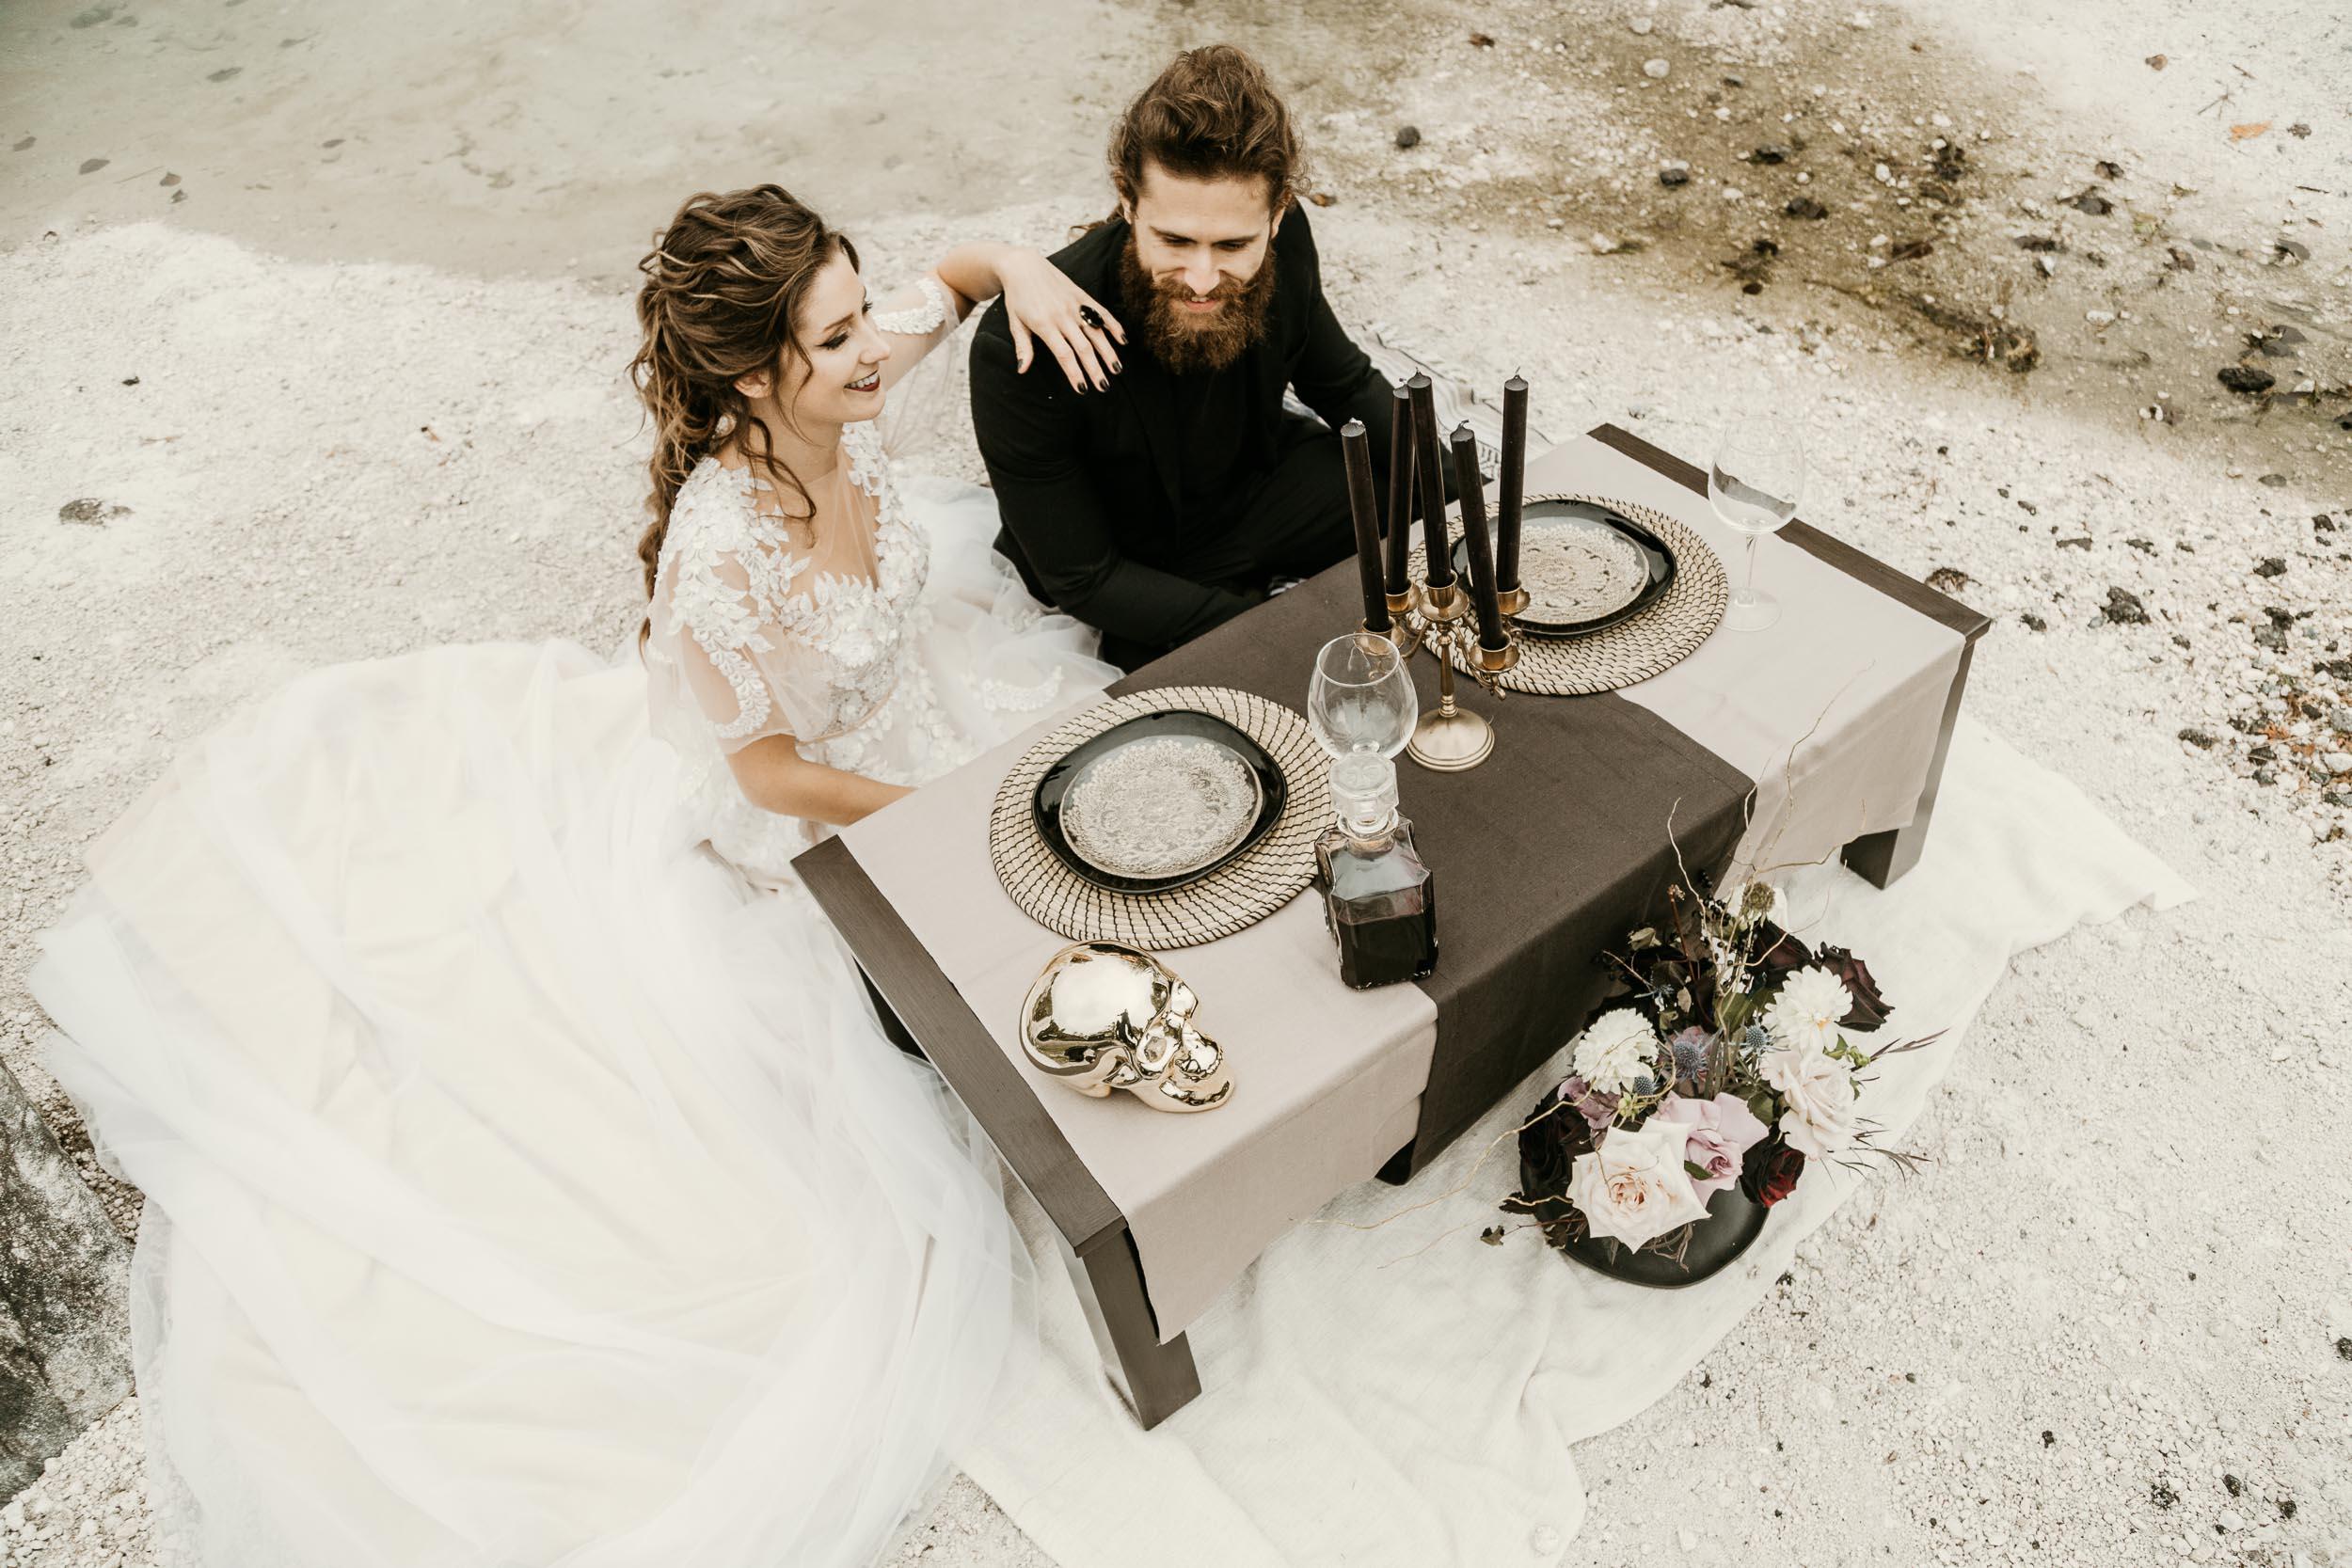 intimate-wedding-elopement-photographer-ottawa-toronto-0639.jpg